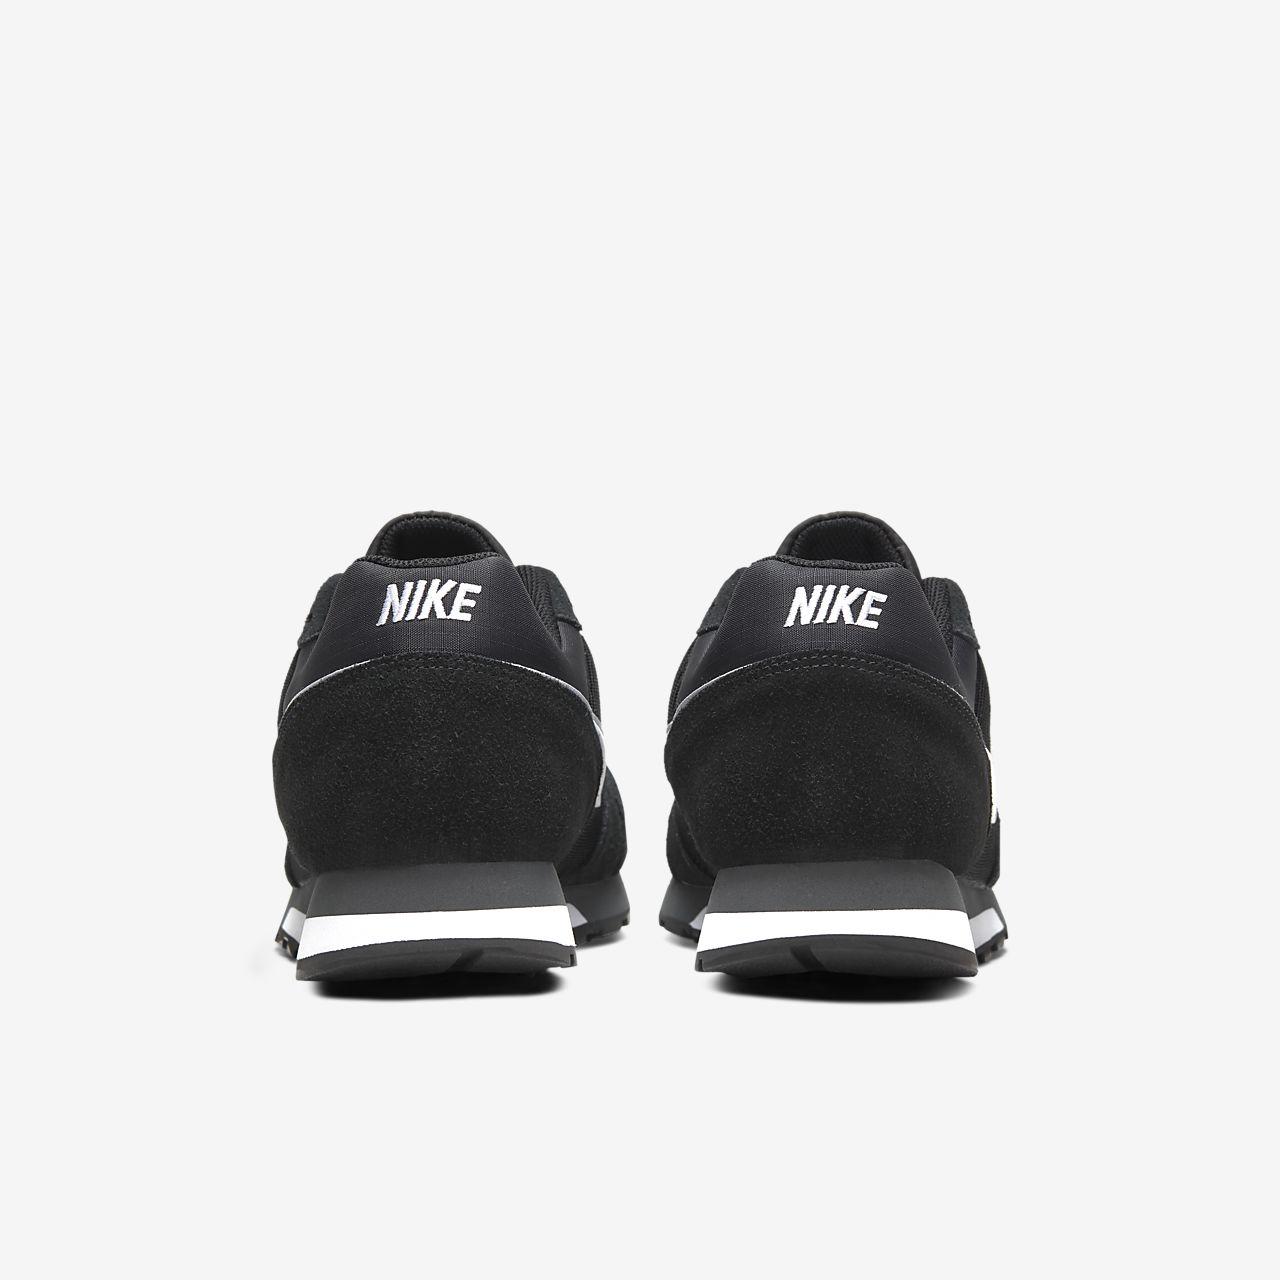 858caad4d Nike MD Runner 2 Men s Shoe. Nike.com GB